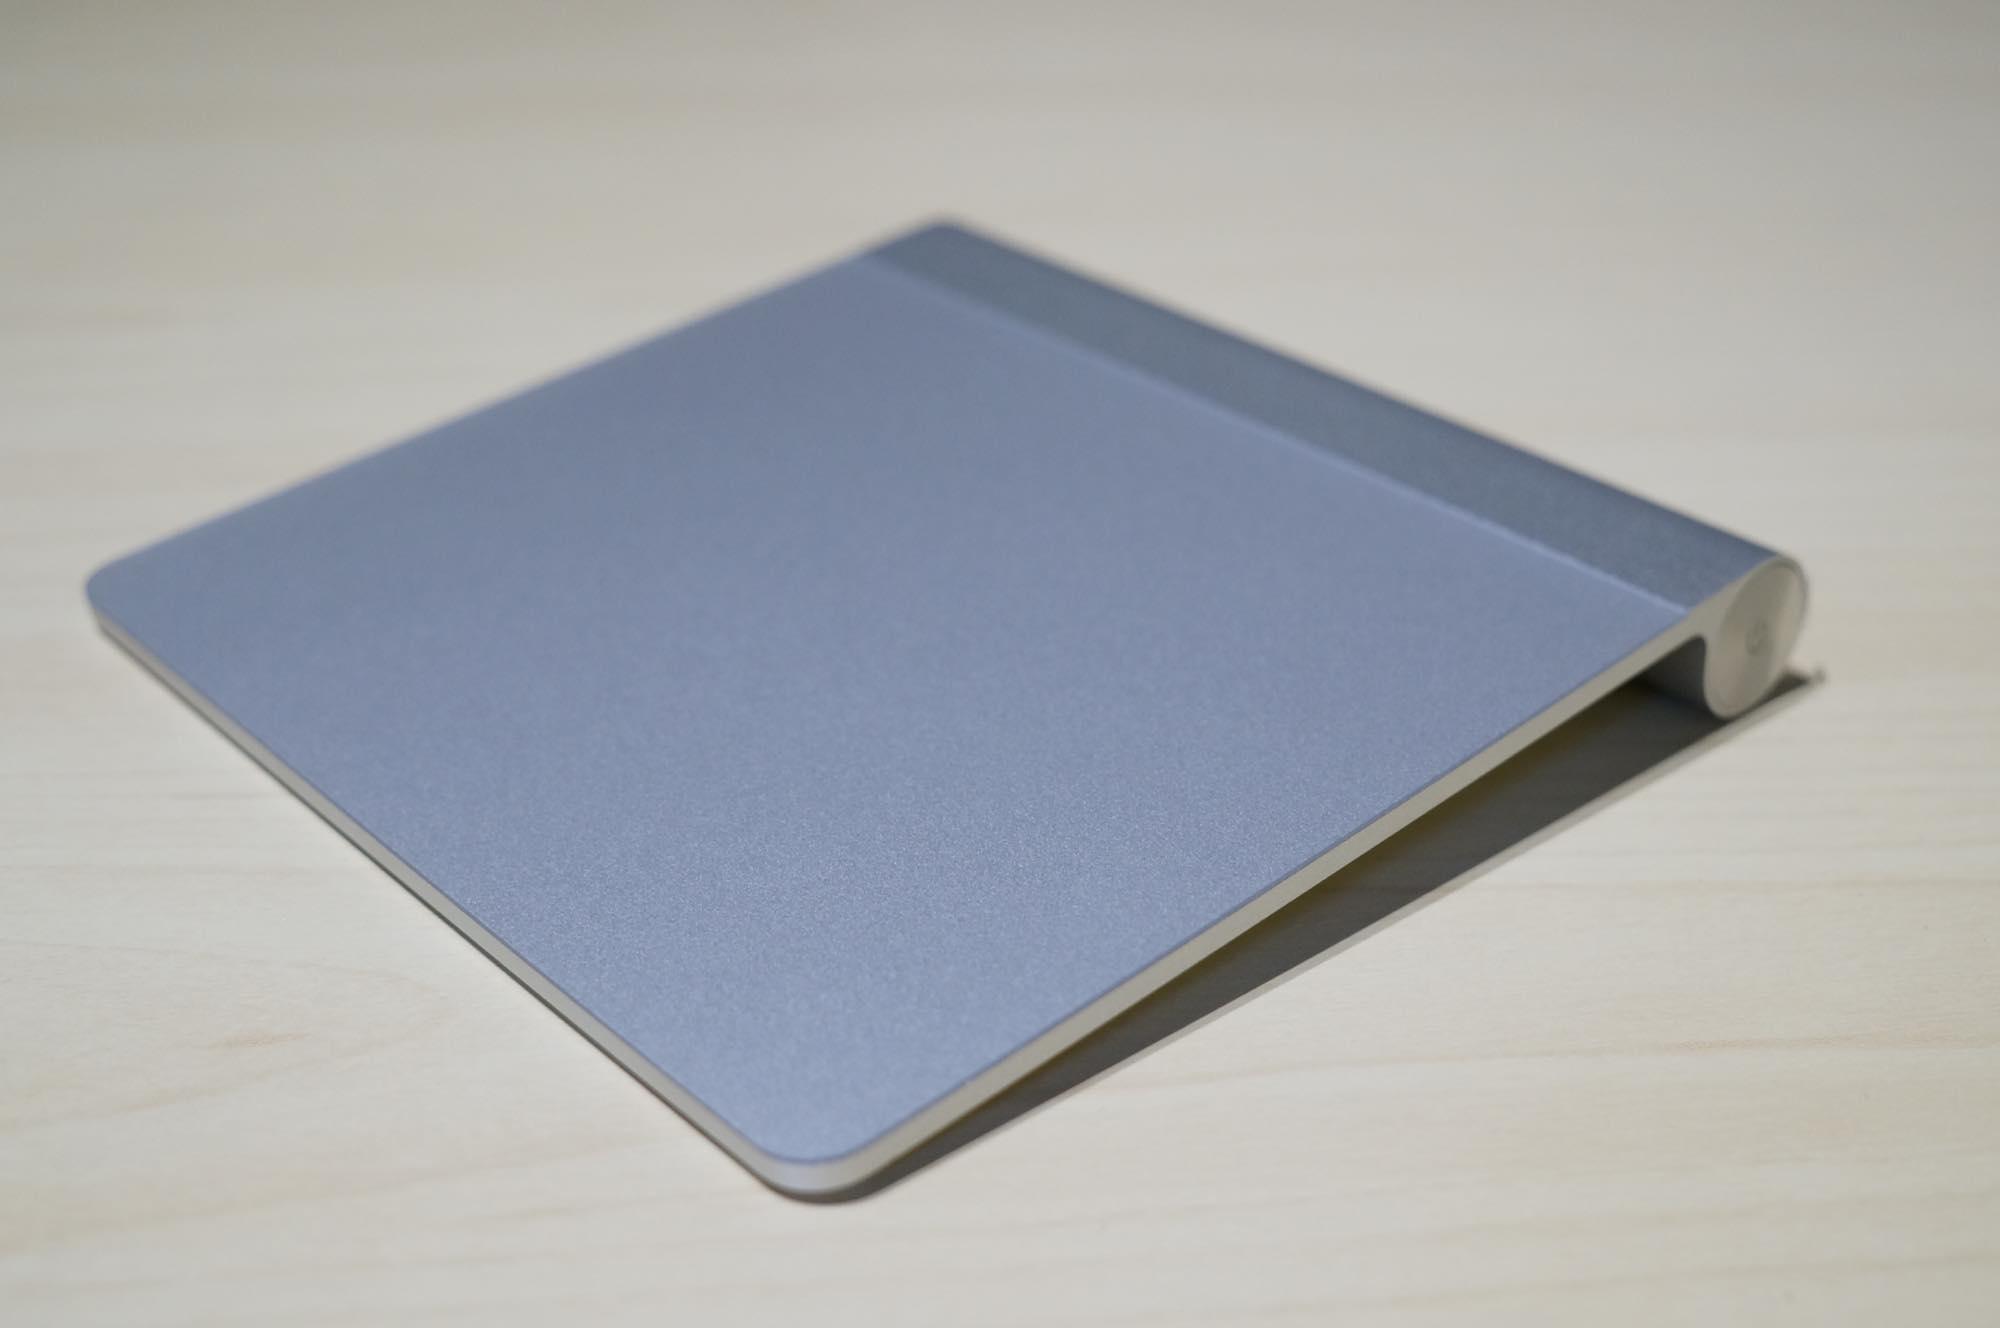 Magic-TrackPad2